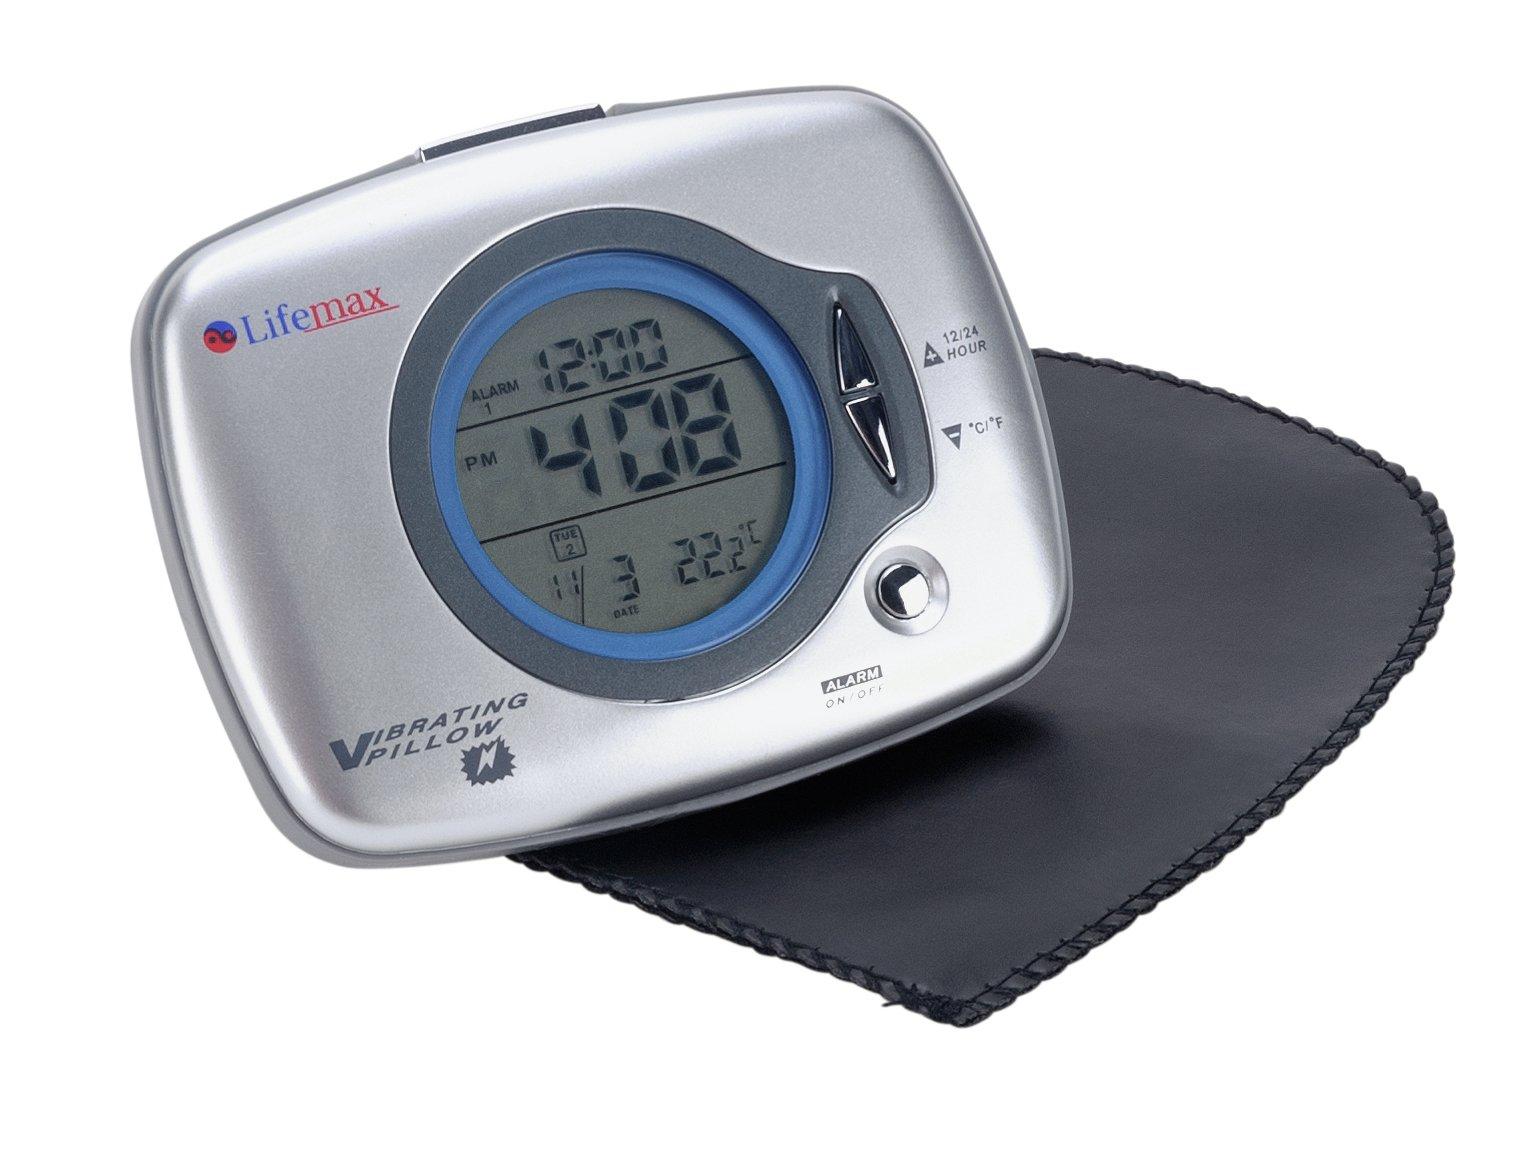 Lifemax Under Pillow Vibration Alarm Clock